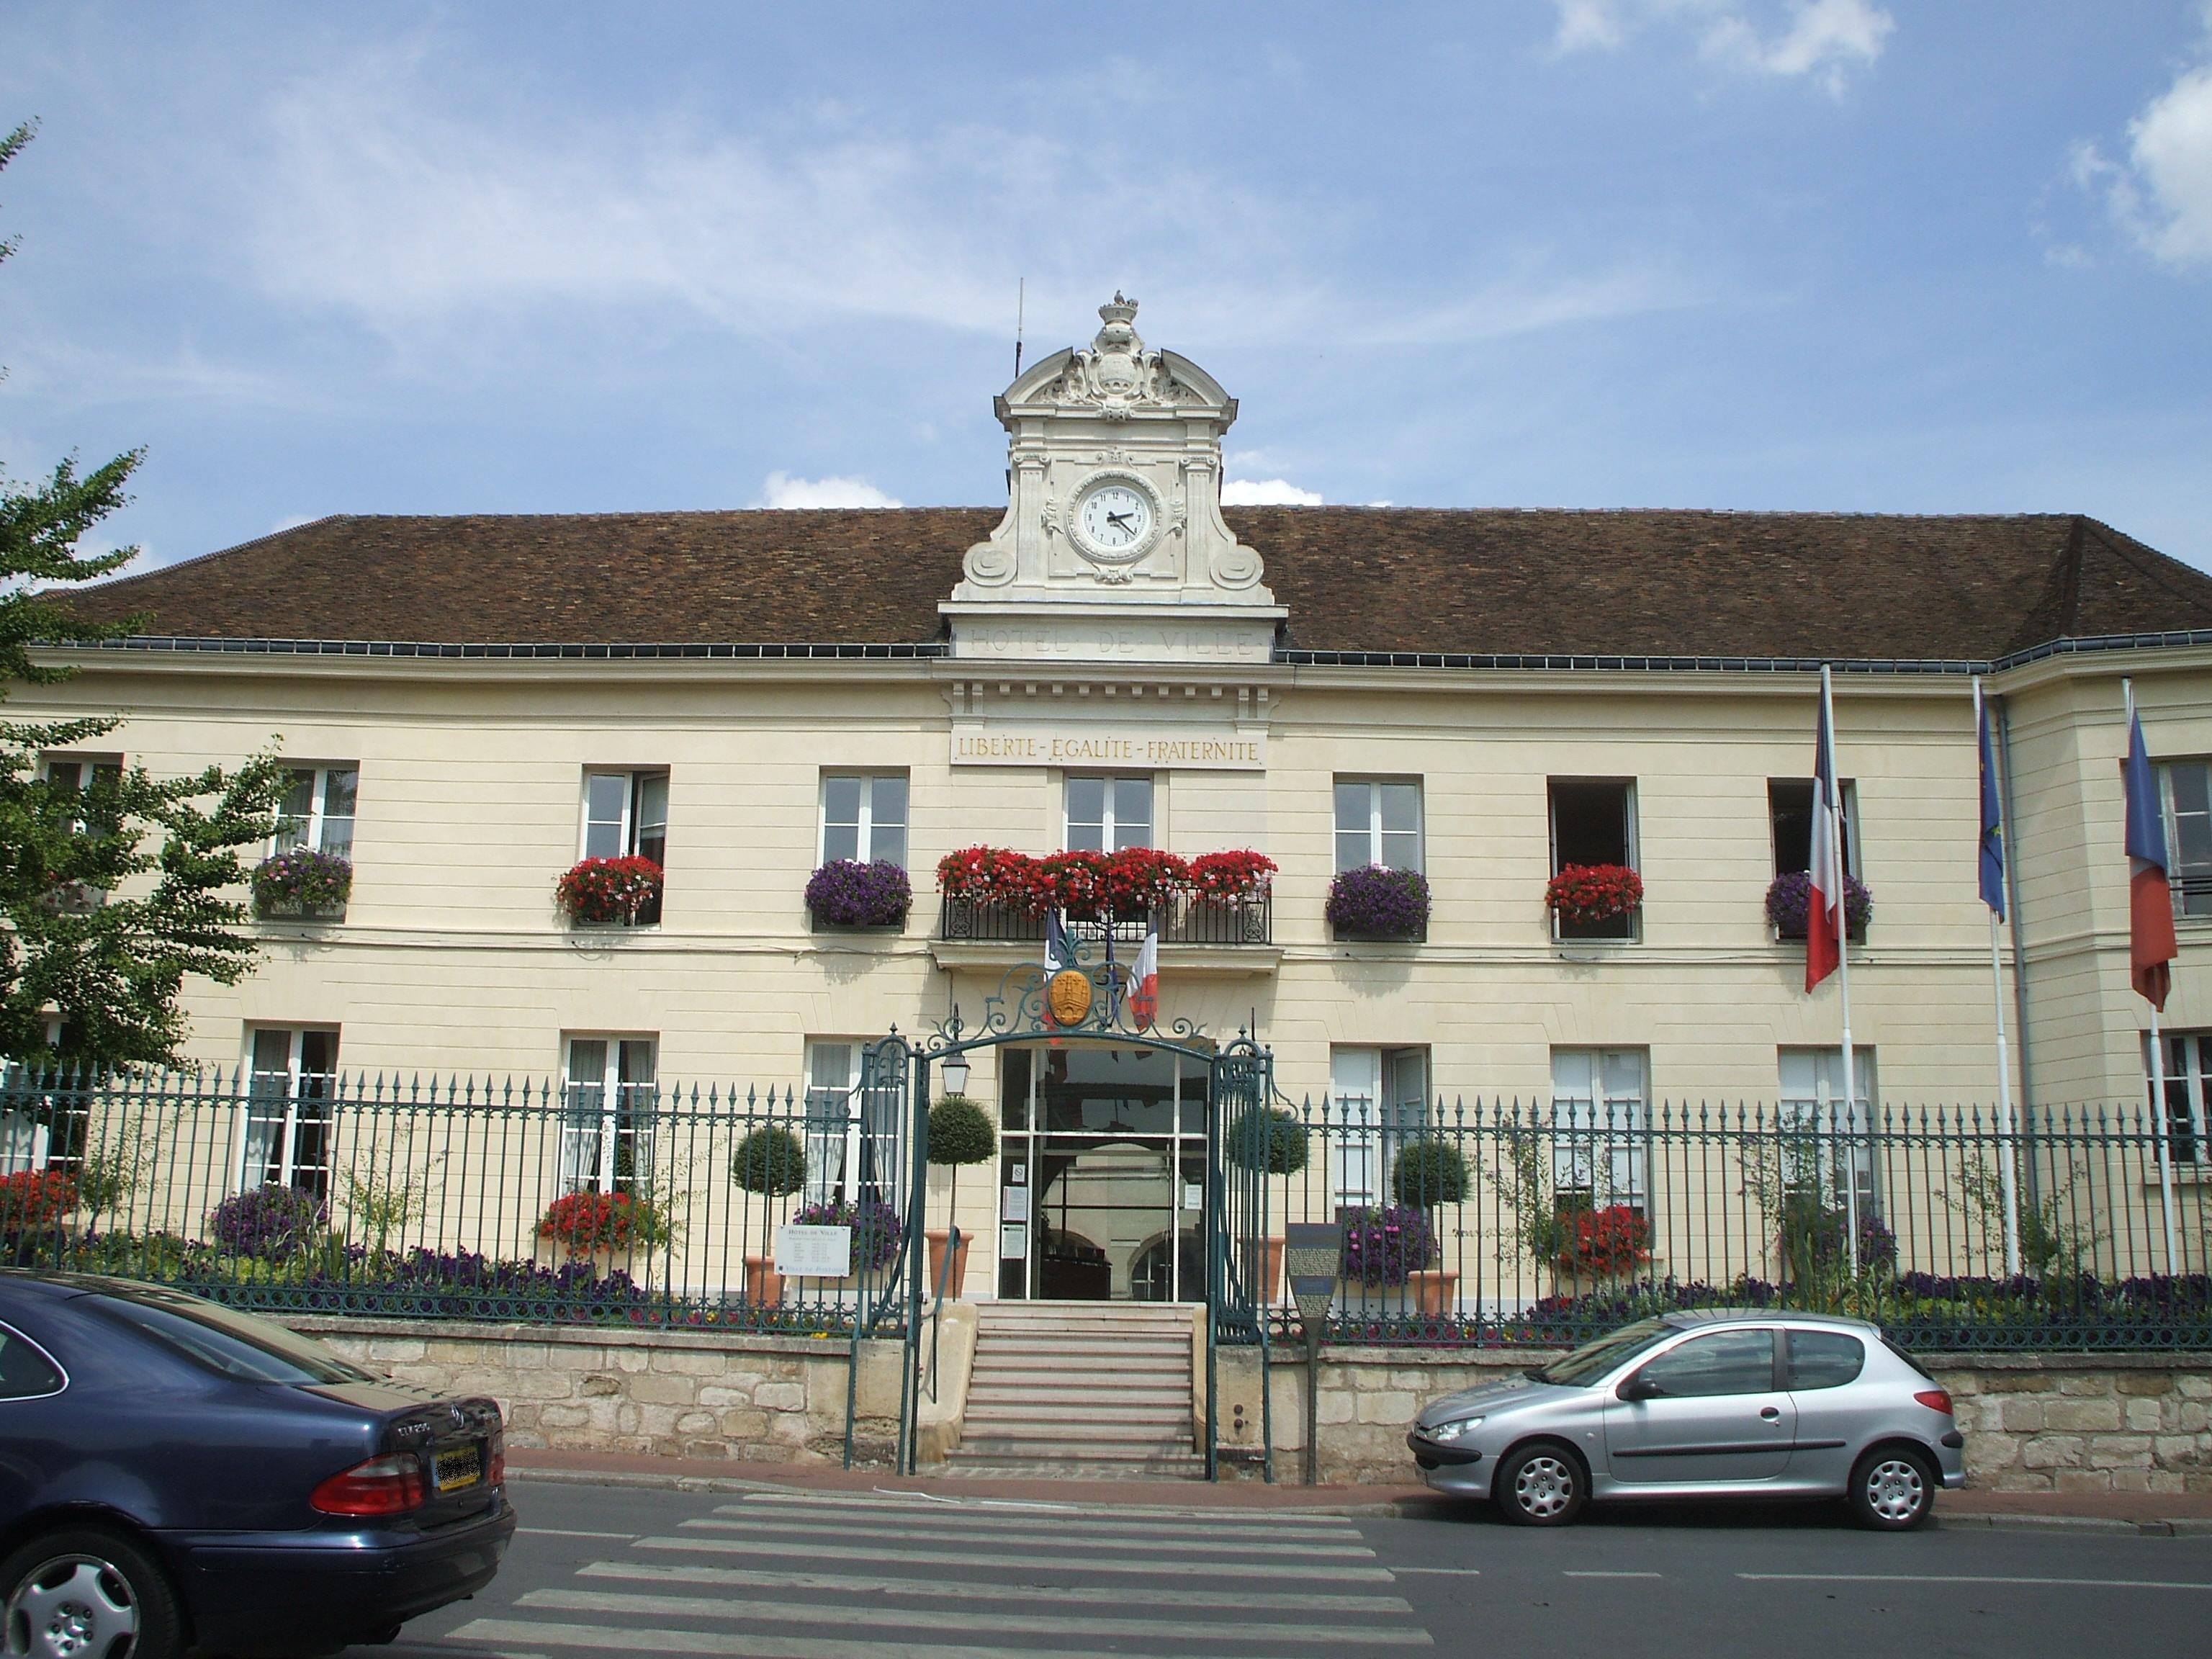 Hotel A Cergy Saint Christophe